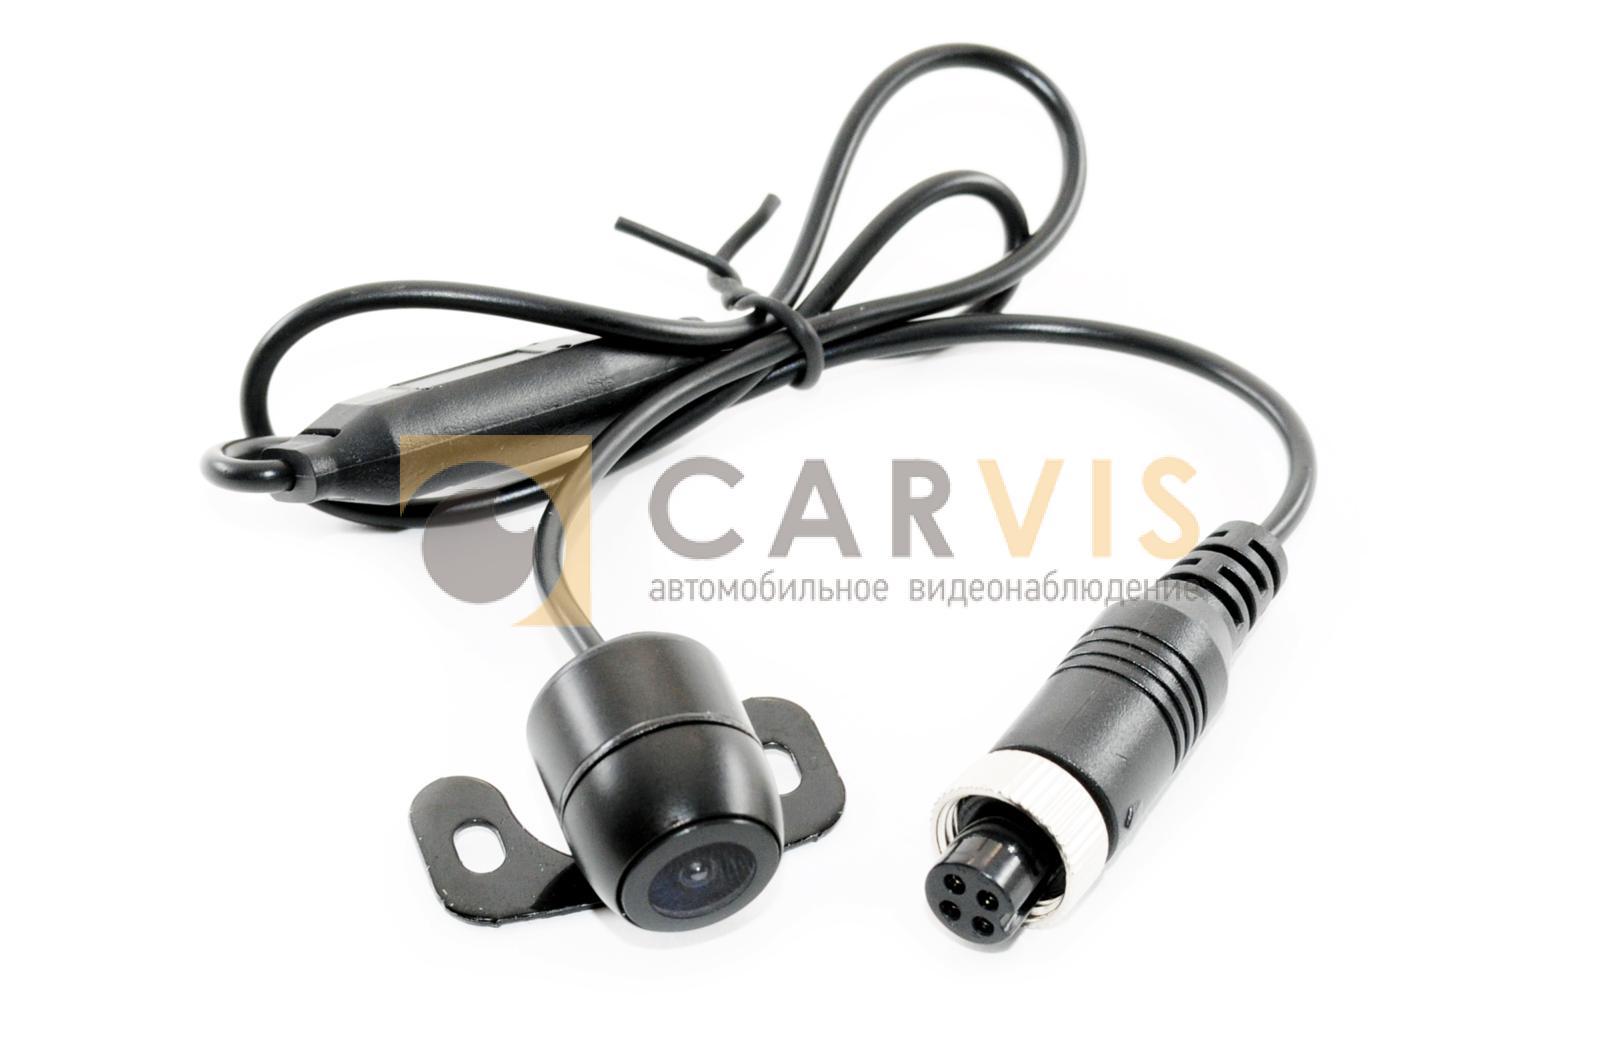 Камера Carvis MC-401 фото 3